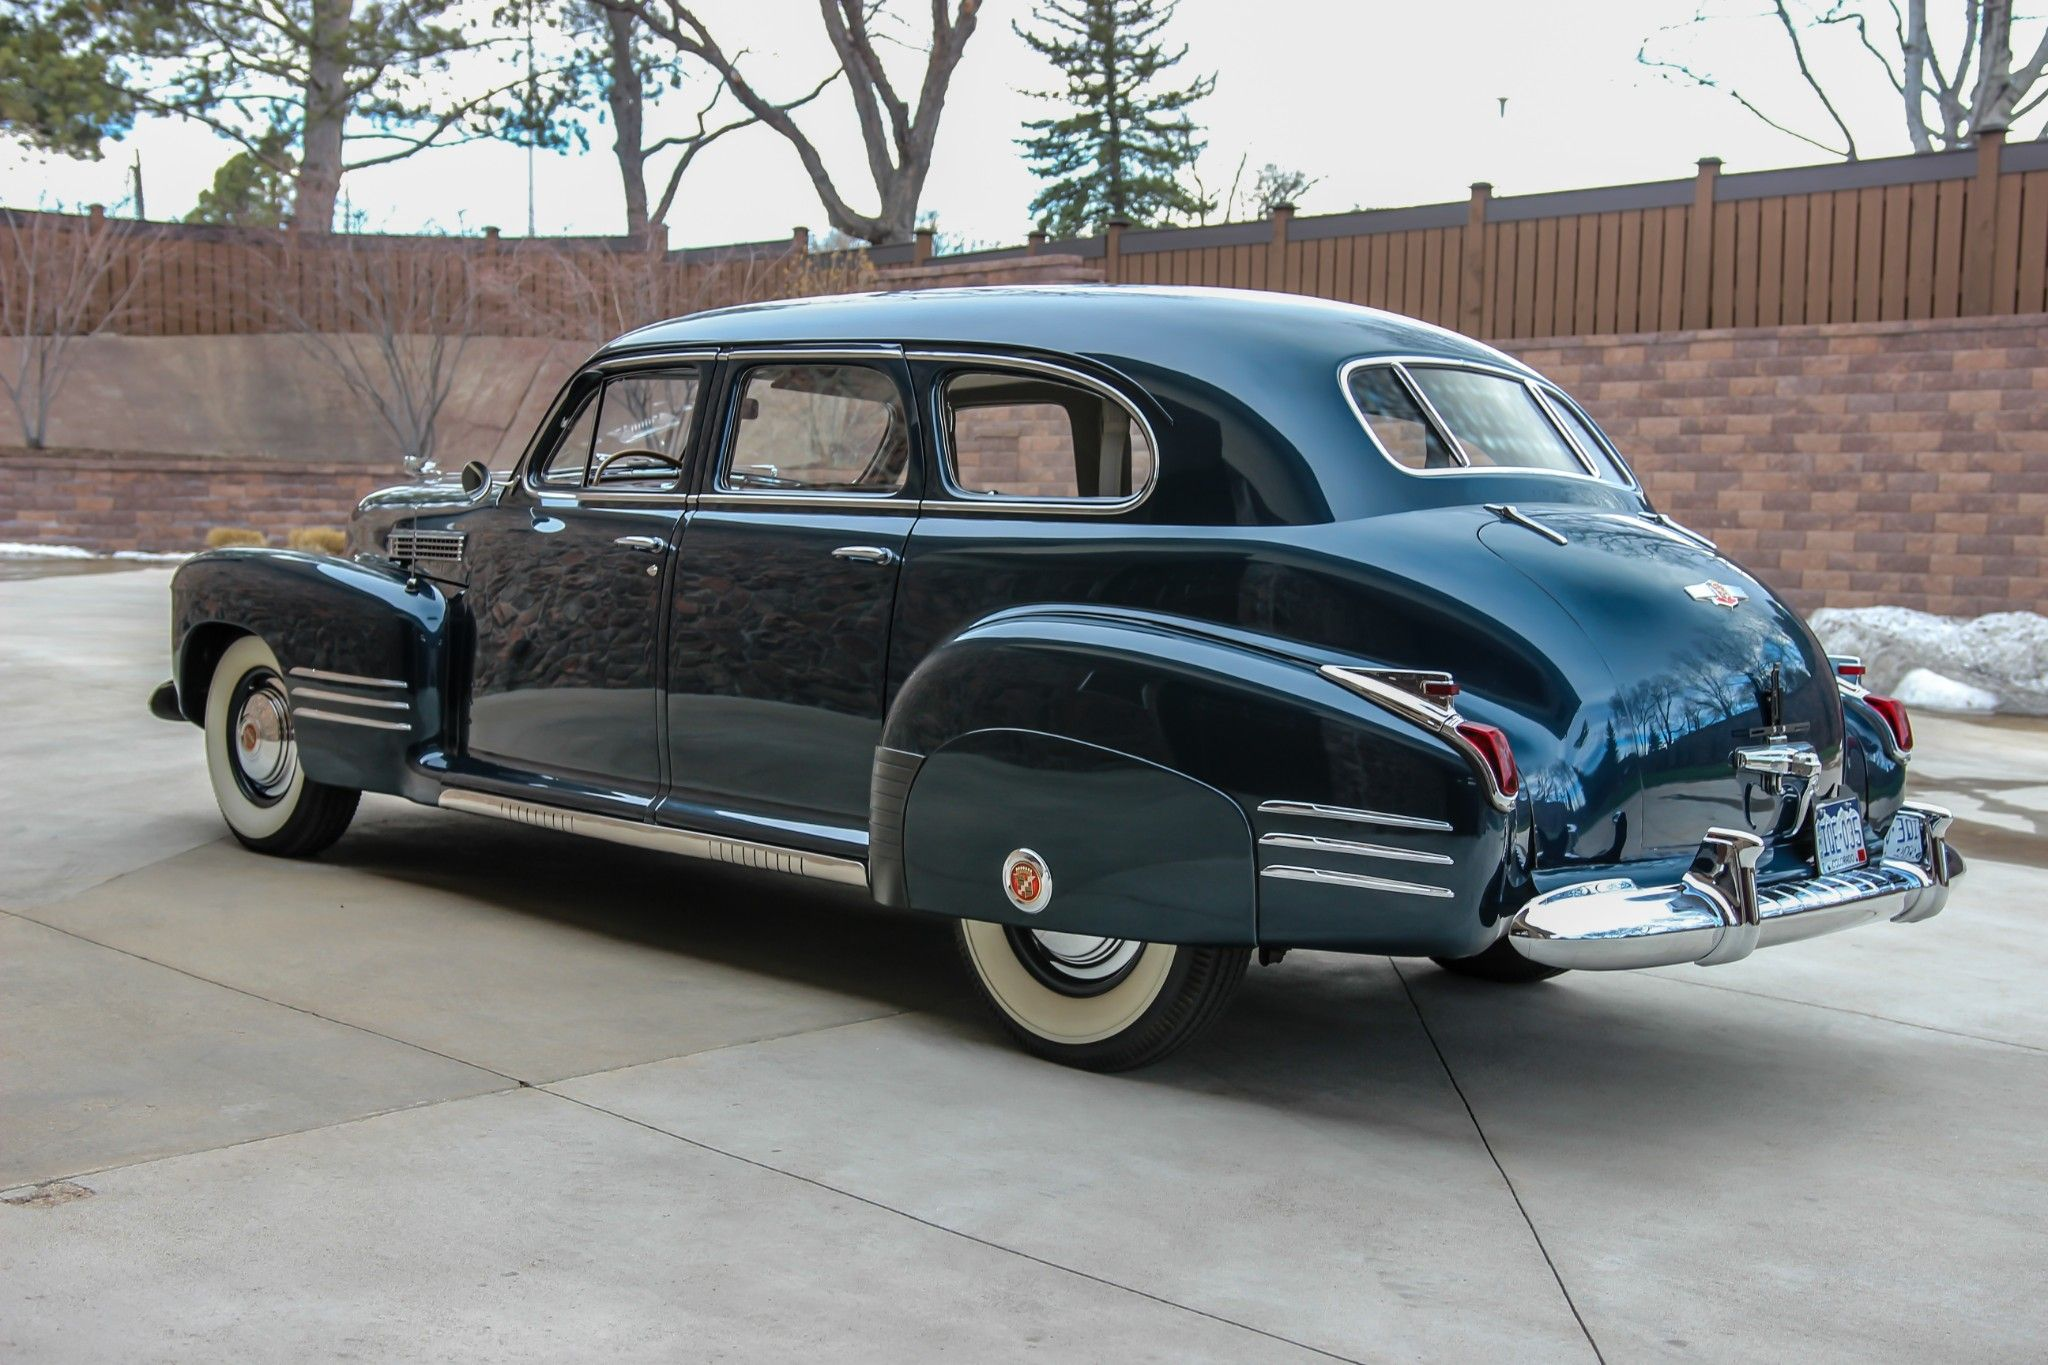 1941 Cadillac Series 67 Sedan for sale on BaT Auctions - ending ...